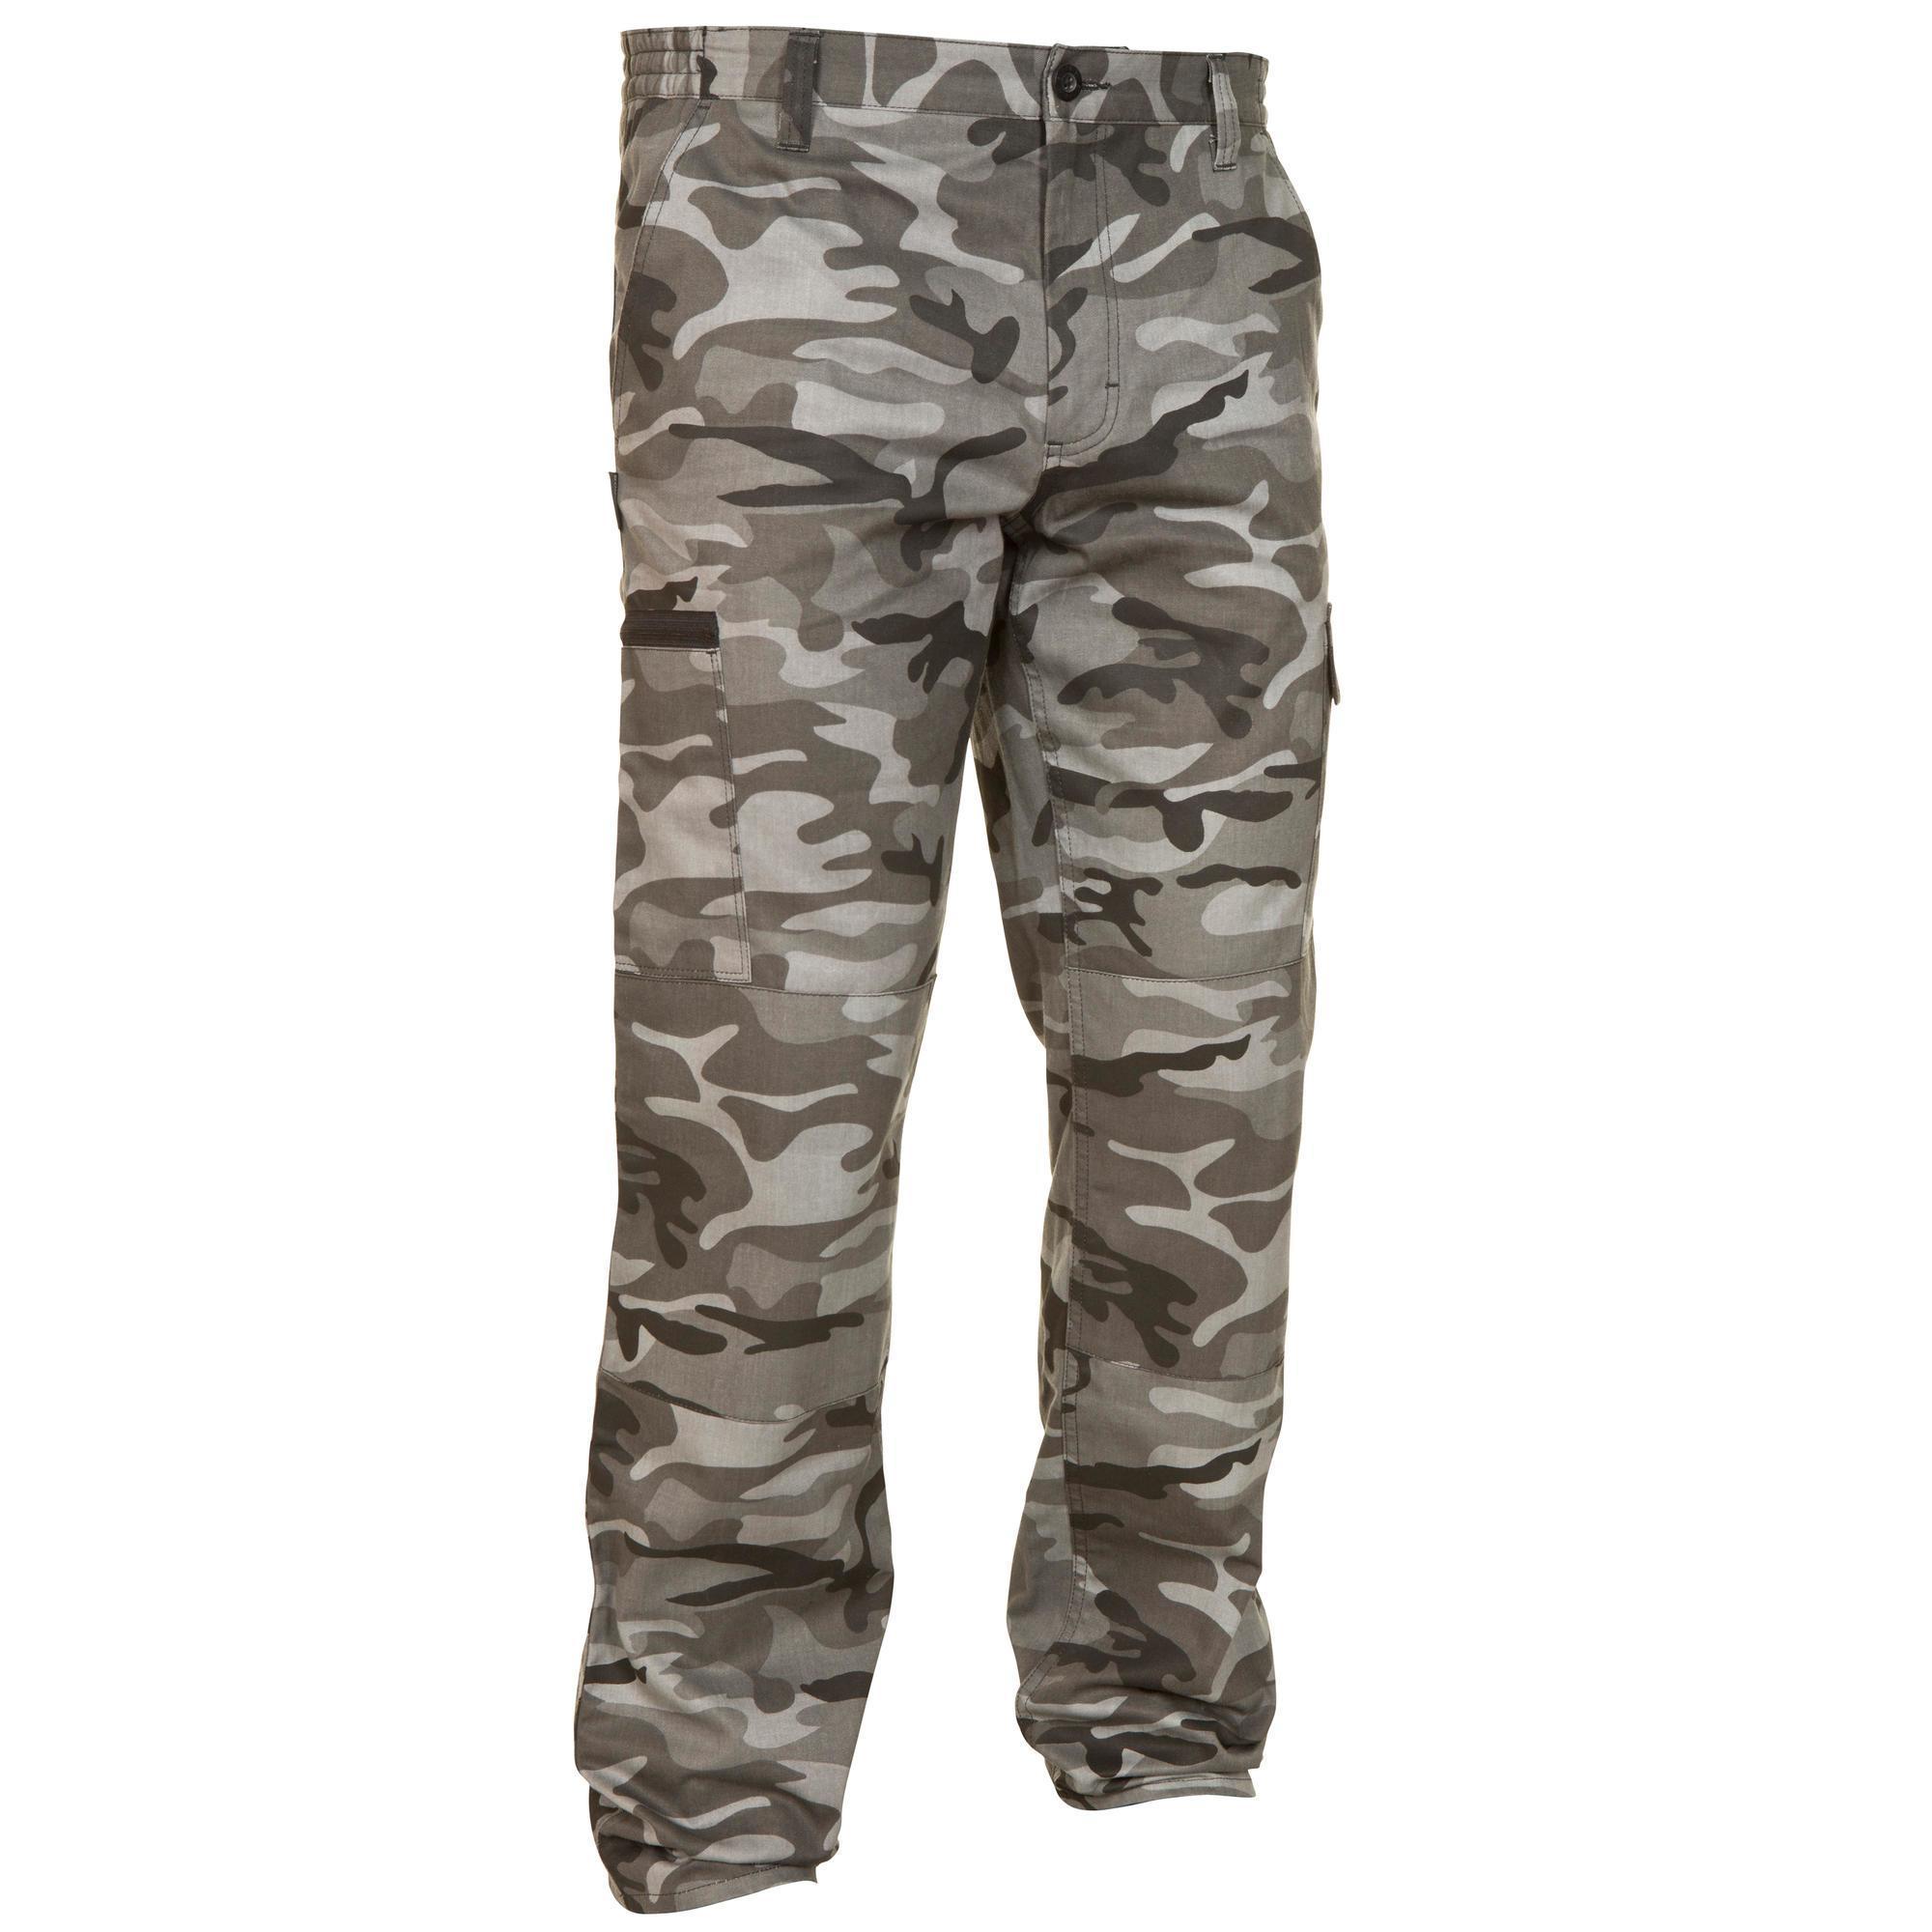 Jagdhose Steppe 300 Camouflage schwarz | Sportbekleidung > Sporthosen > Trekkinghosen | Grau | Solognac